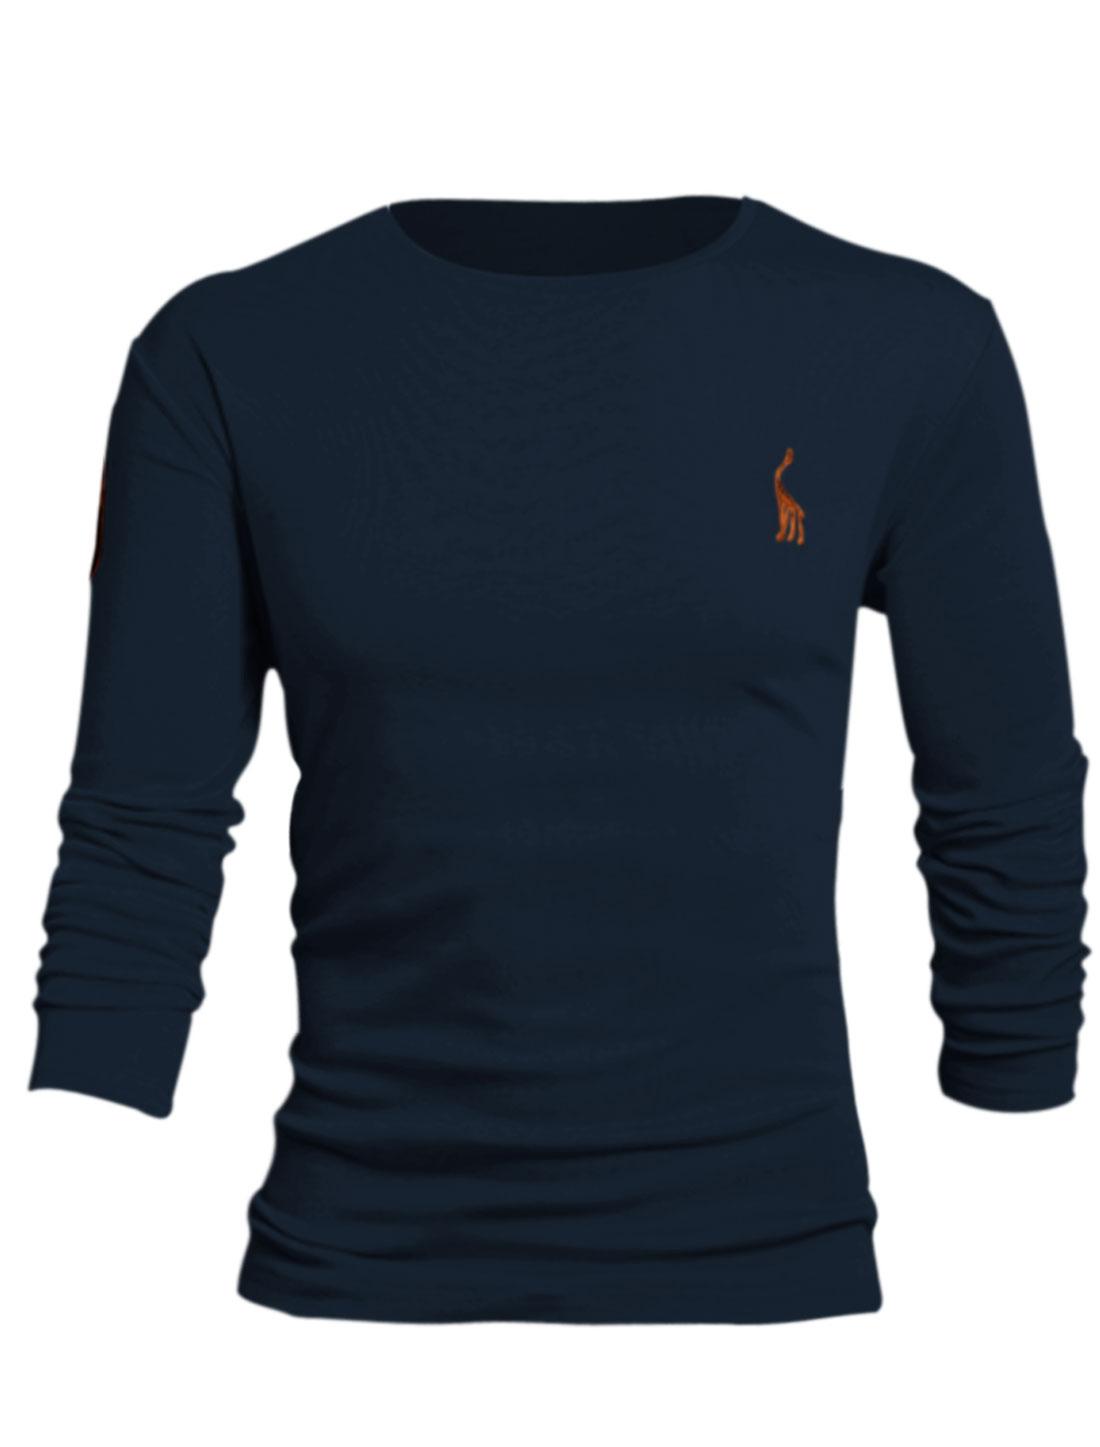 Men Number Applique Slipover Design Cozy Fit Tee Shirt Navy Blue L